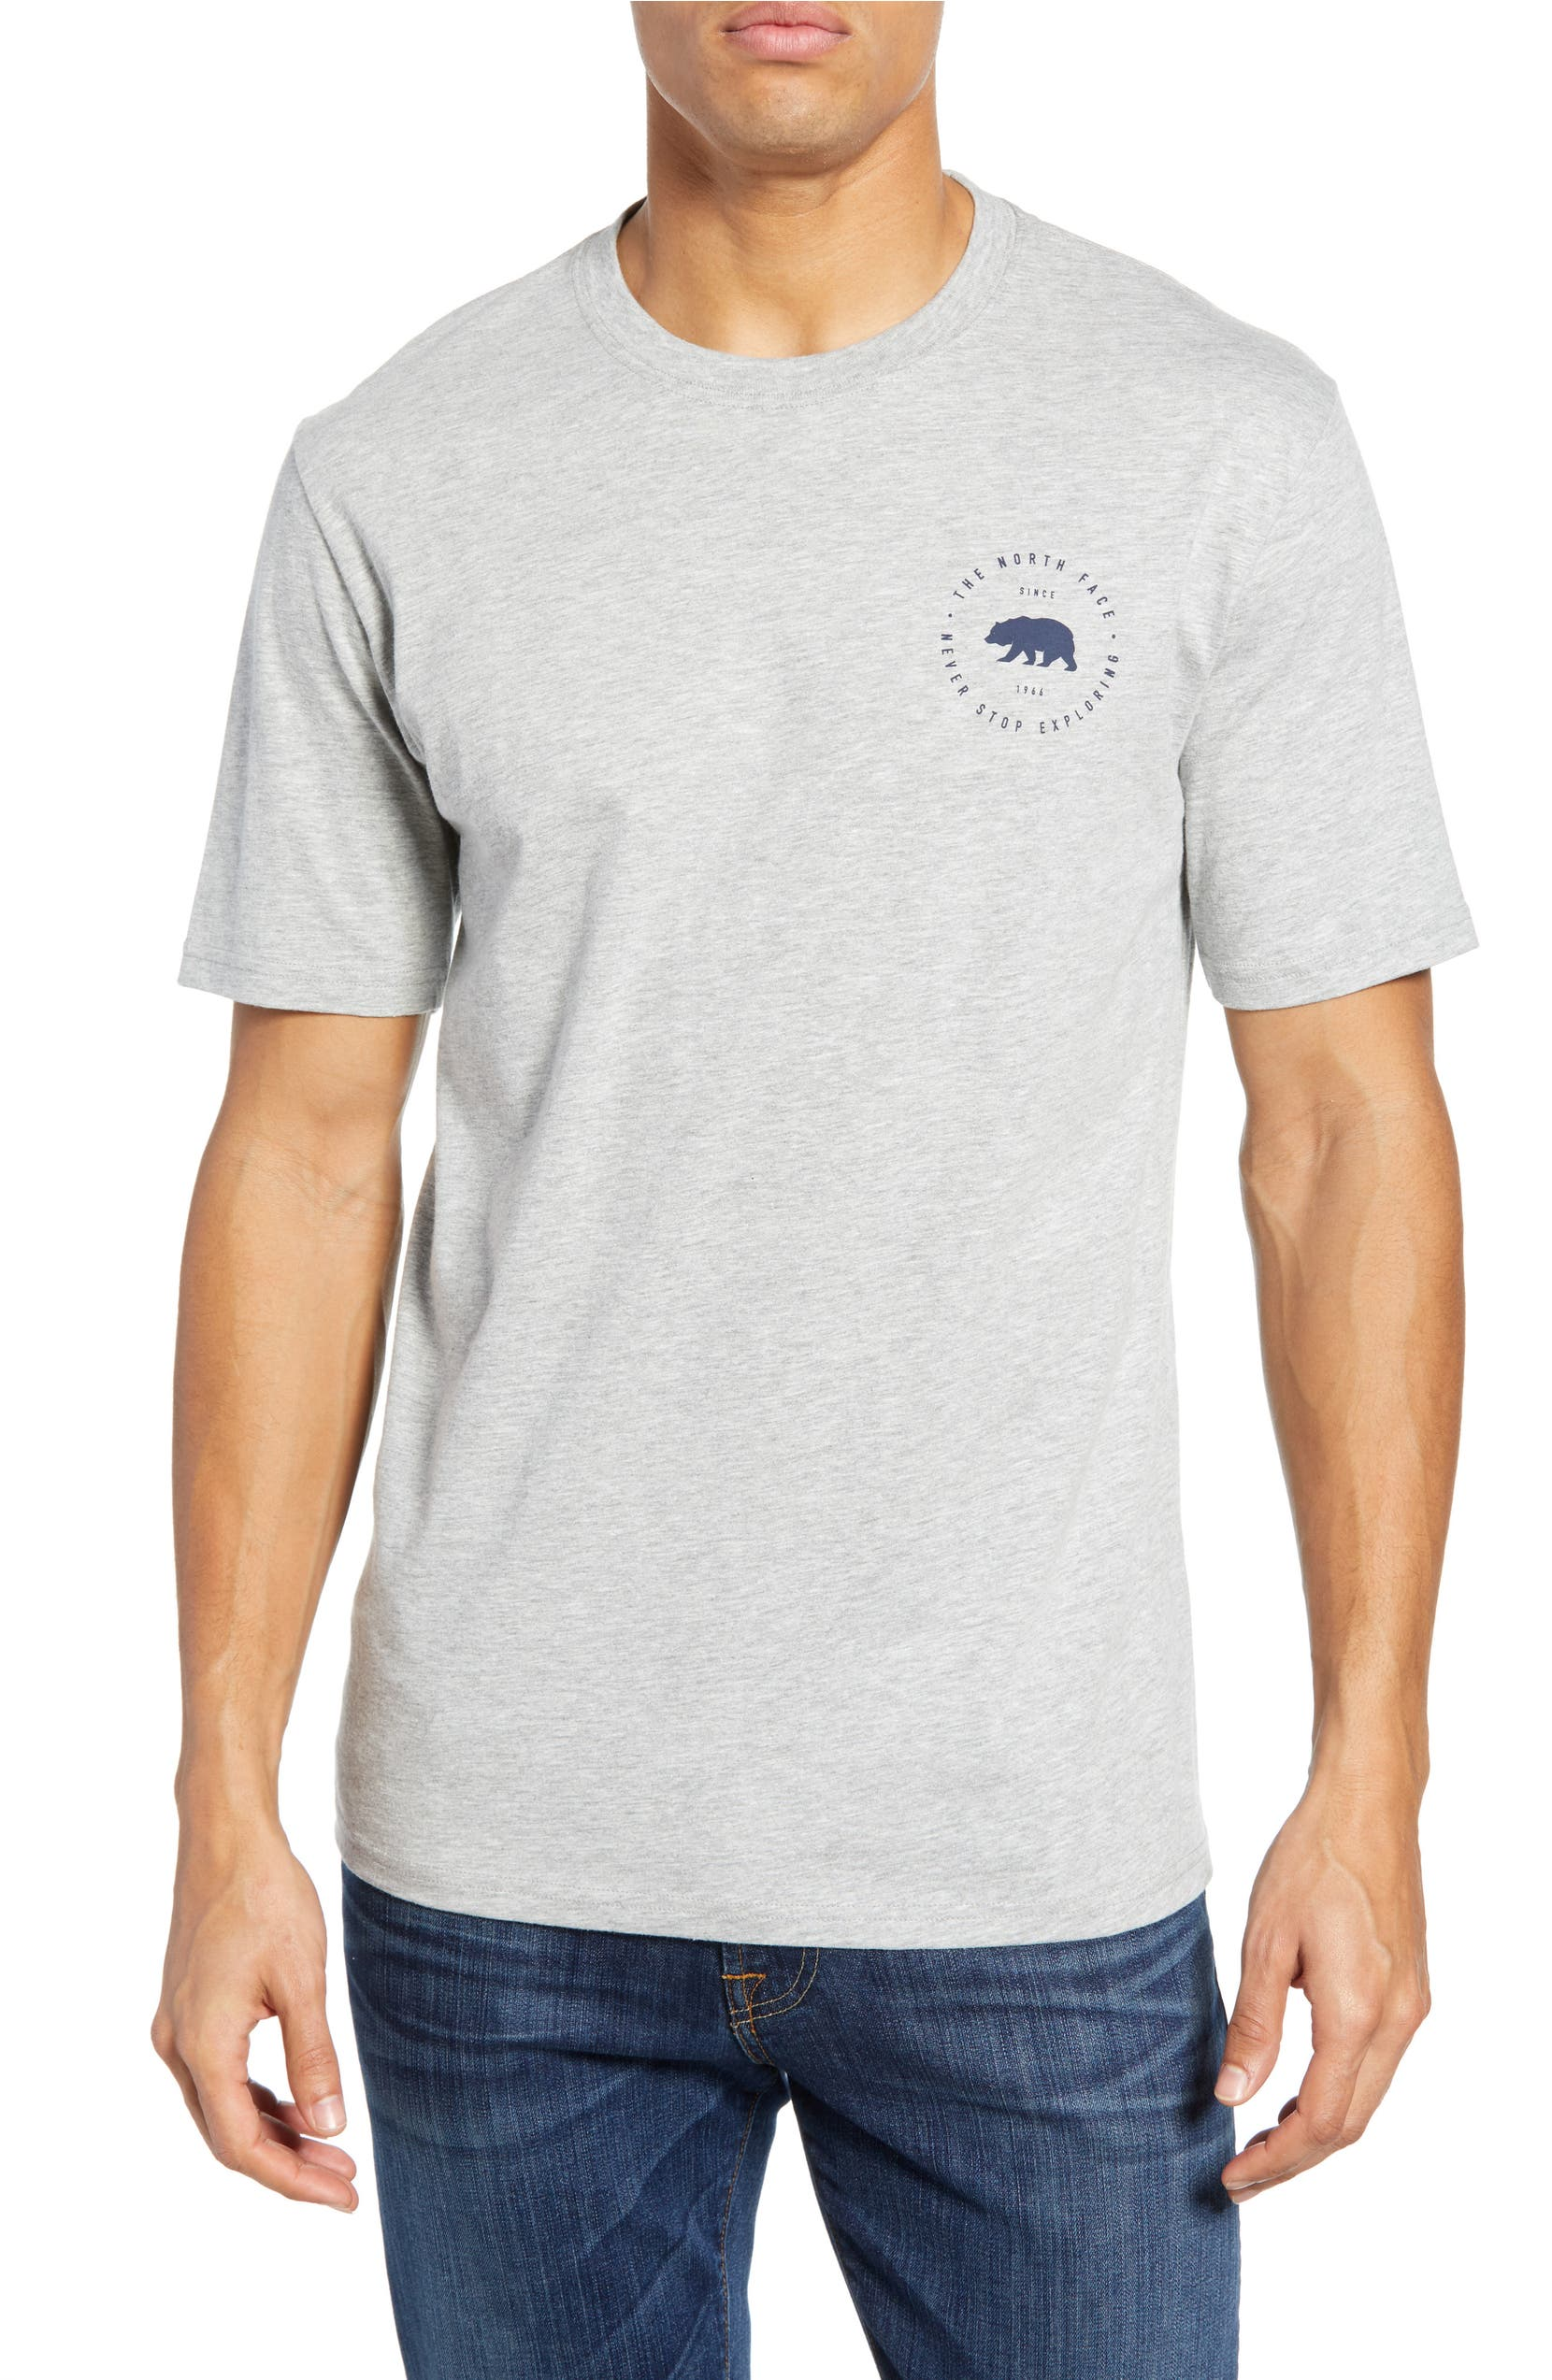 2e603f62f Bearitage Rights T-Shirt